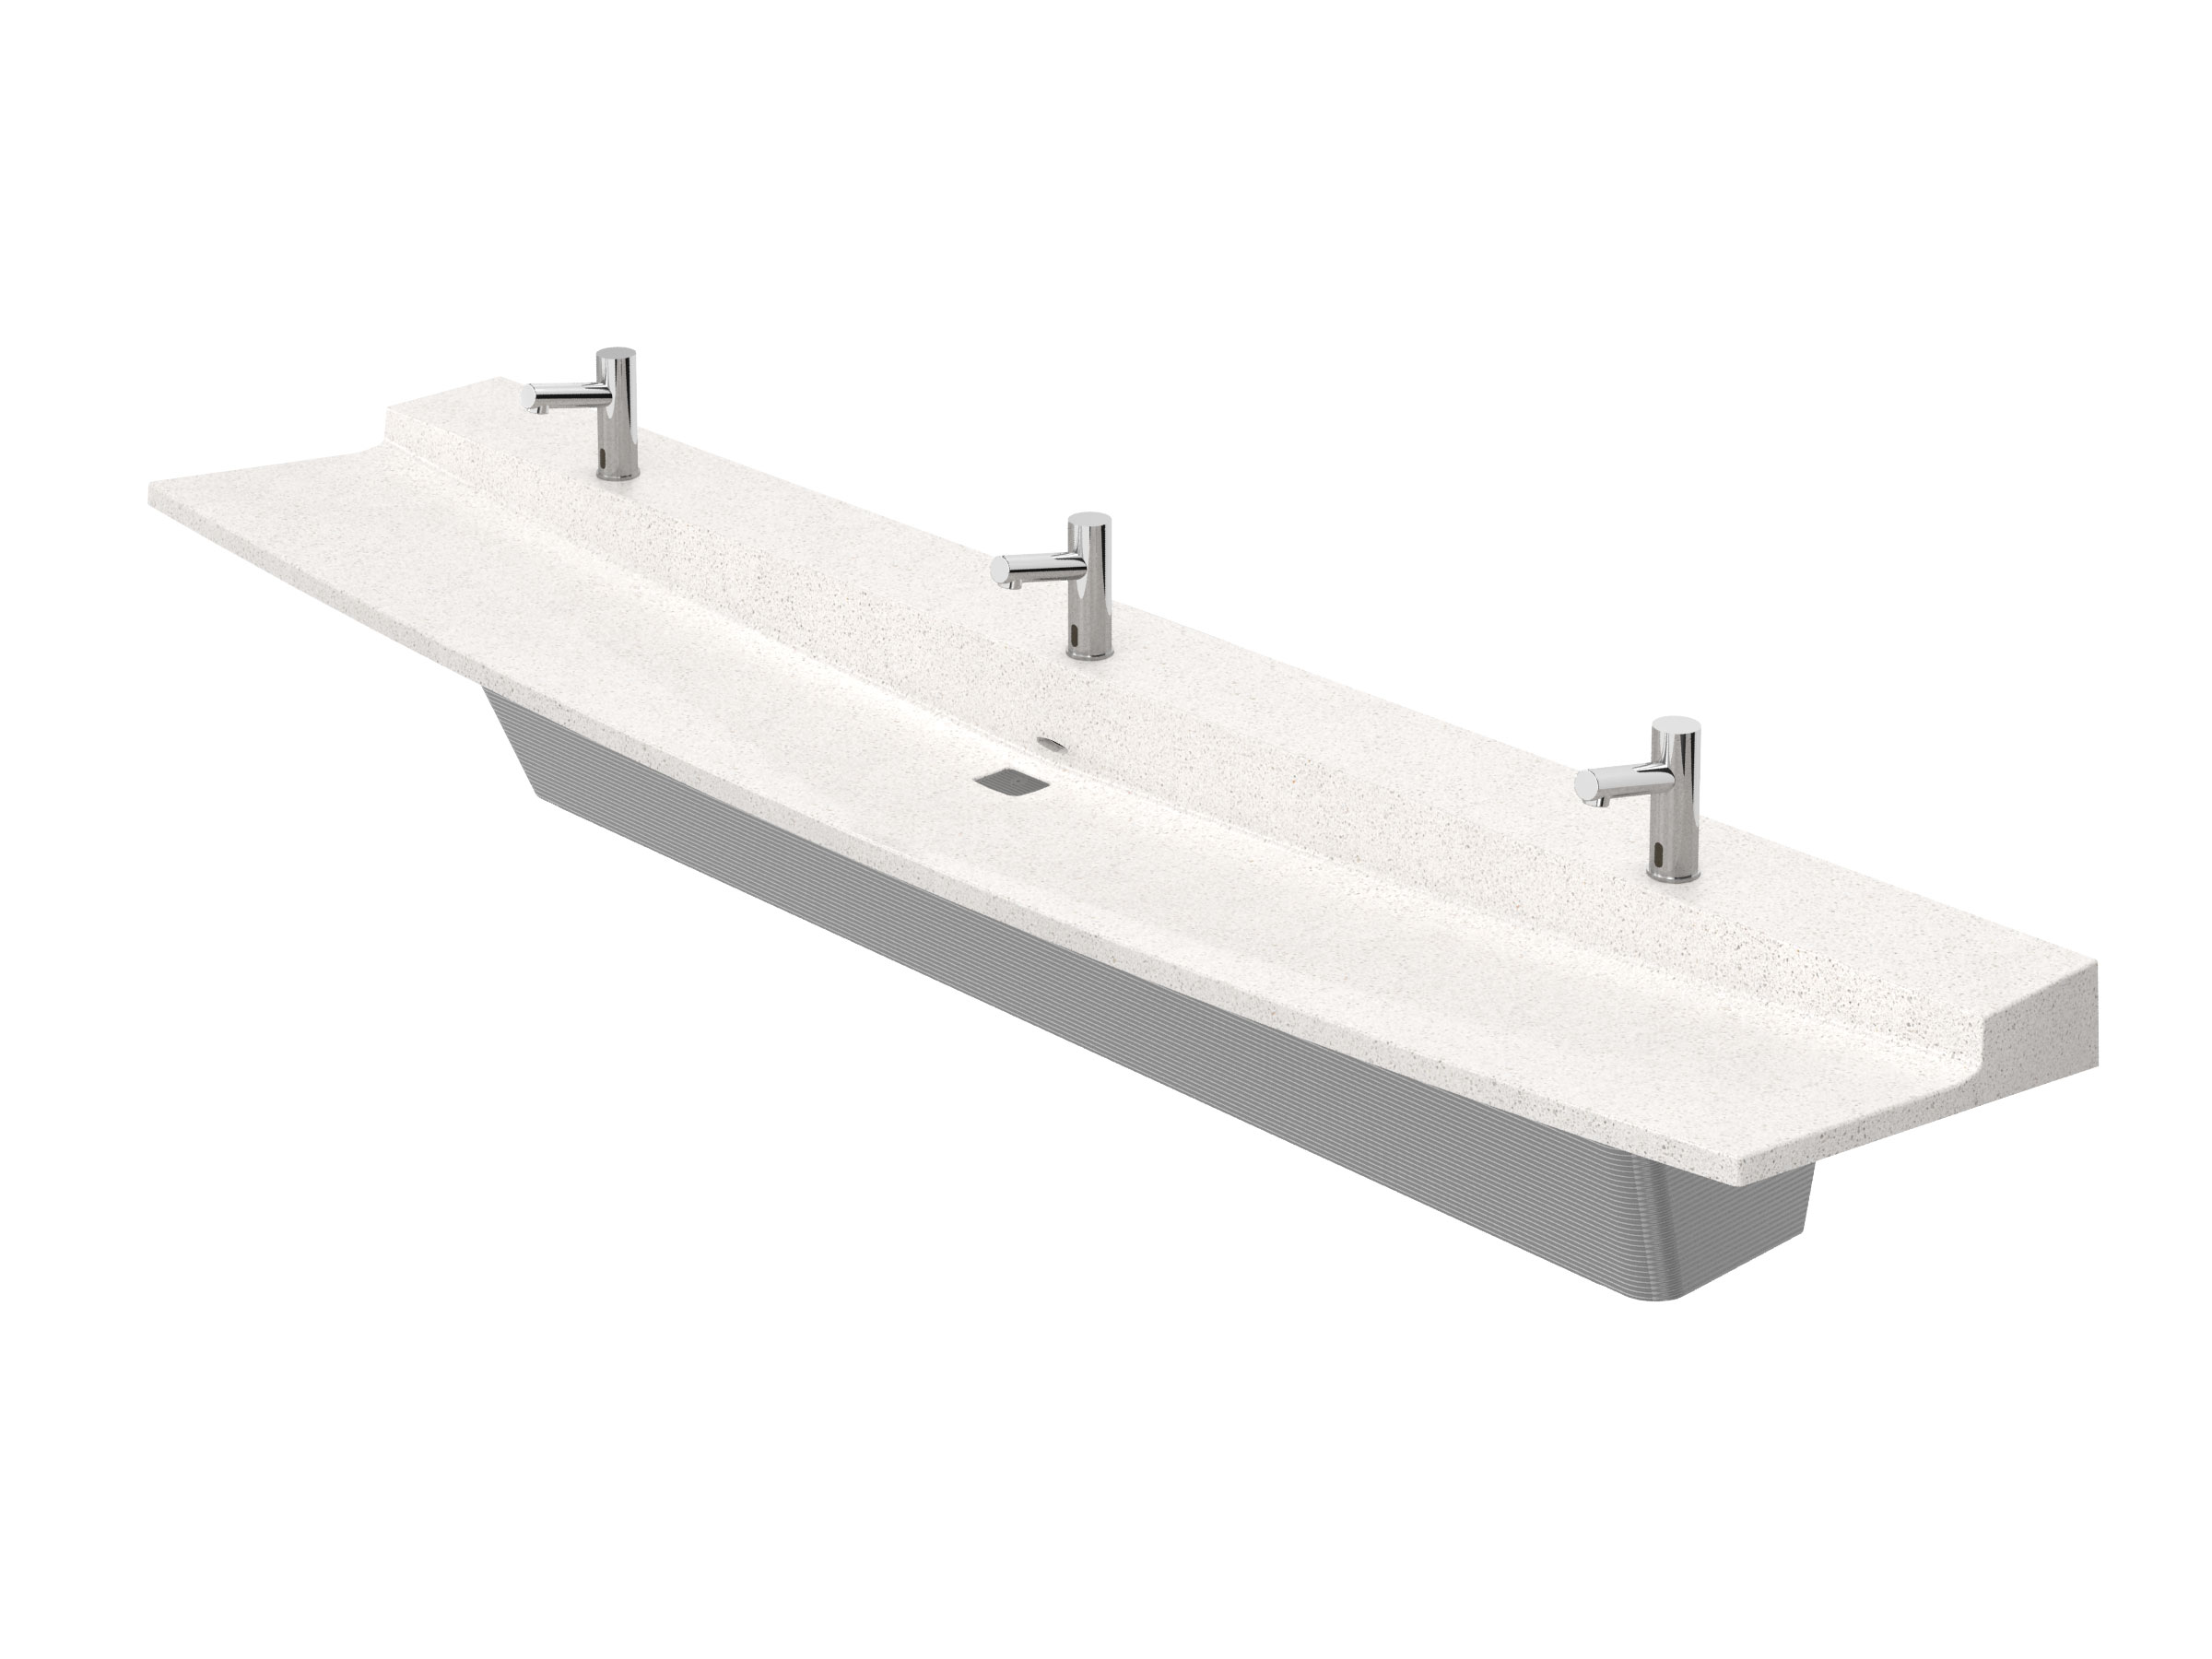 Bradley Commercial Sinks : Station L-Series Verge Lavatory System - Model LVLD3